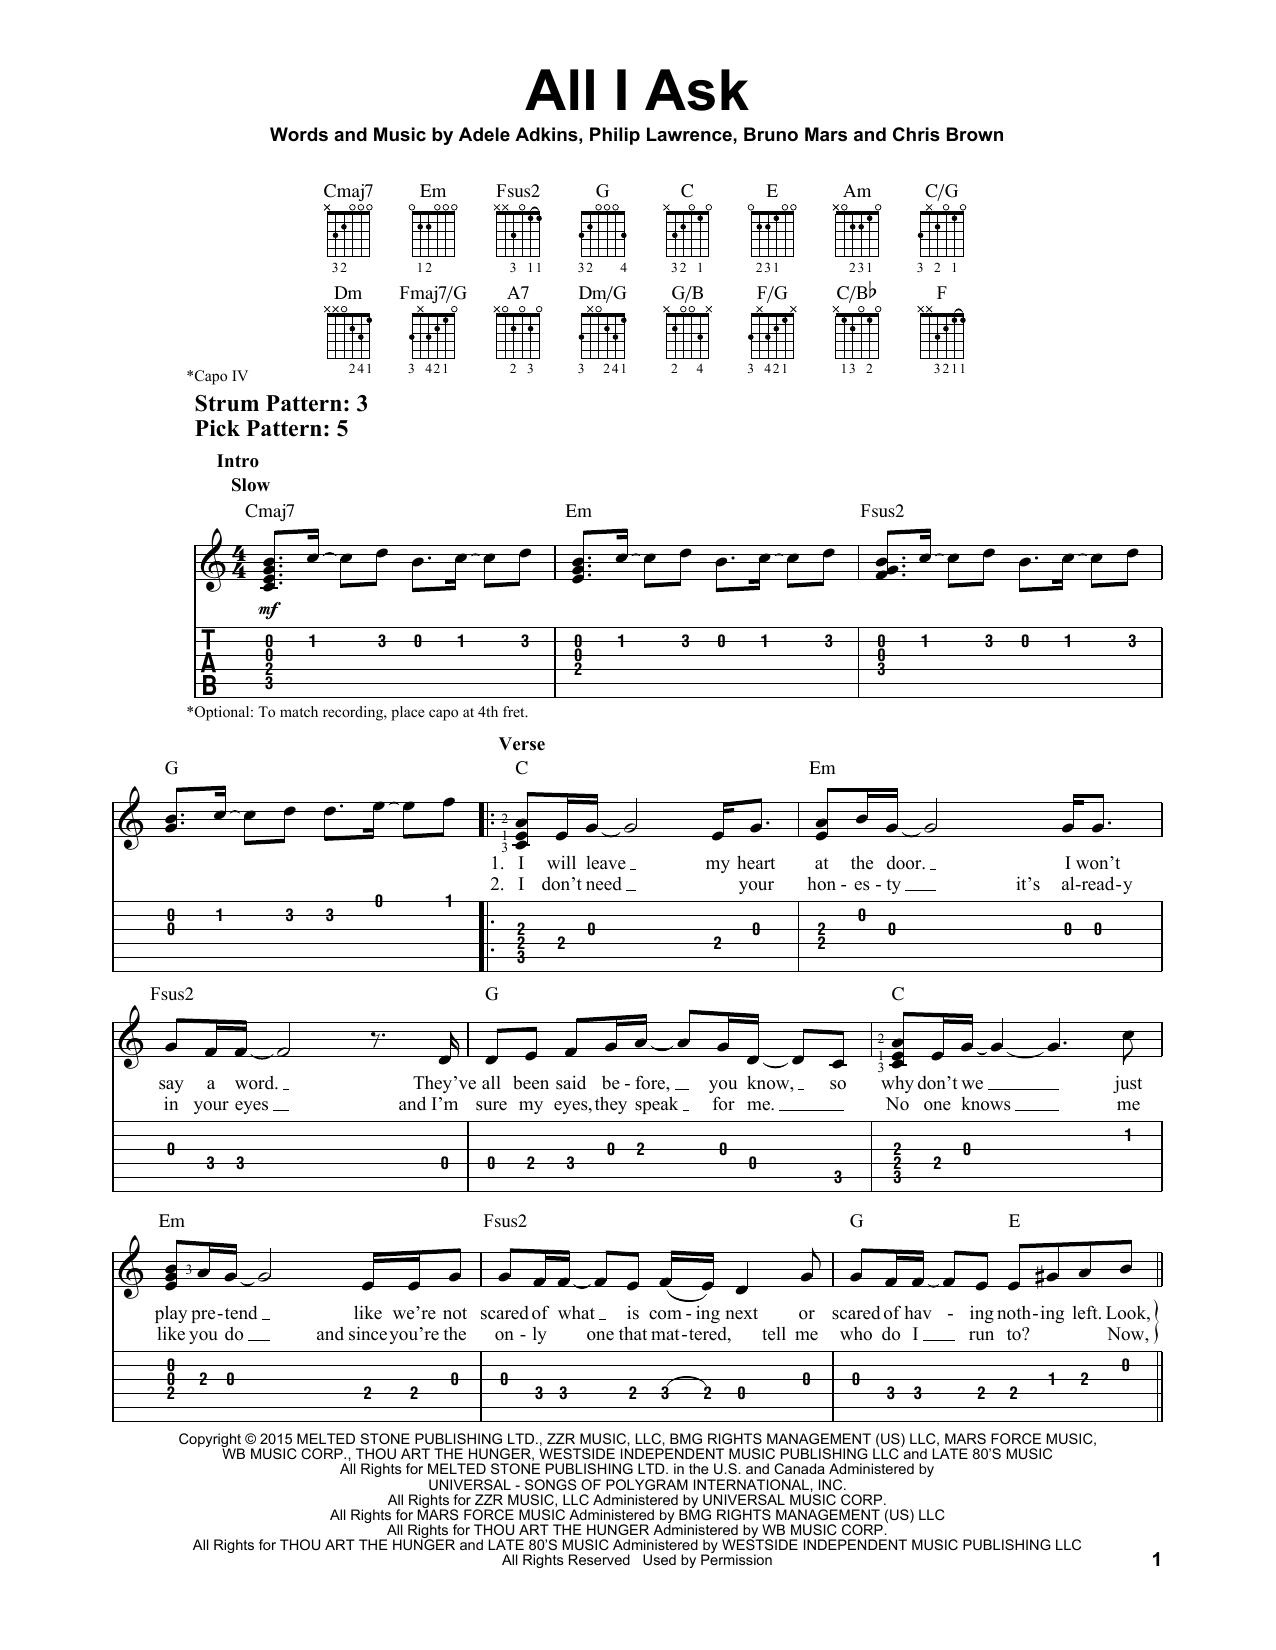 Adele 'All I Ask' Sheet Music Notes, Chords   Download Printable Lyrics &  Chords   SKU 15